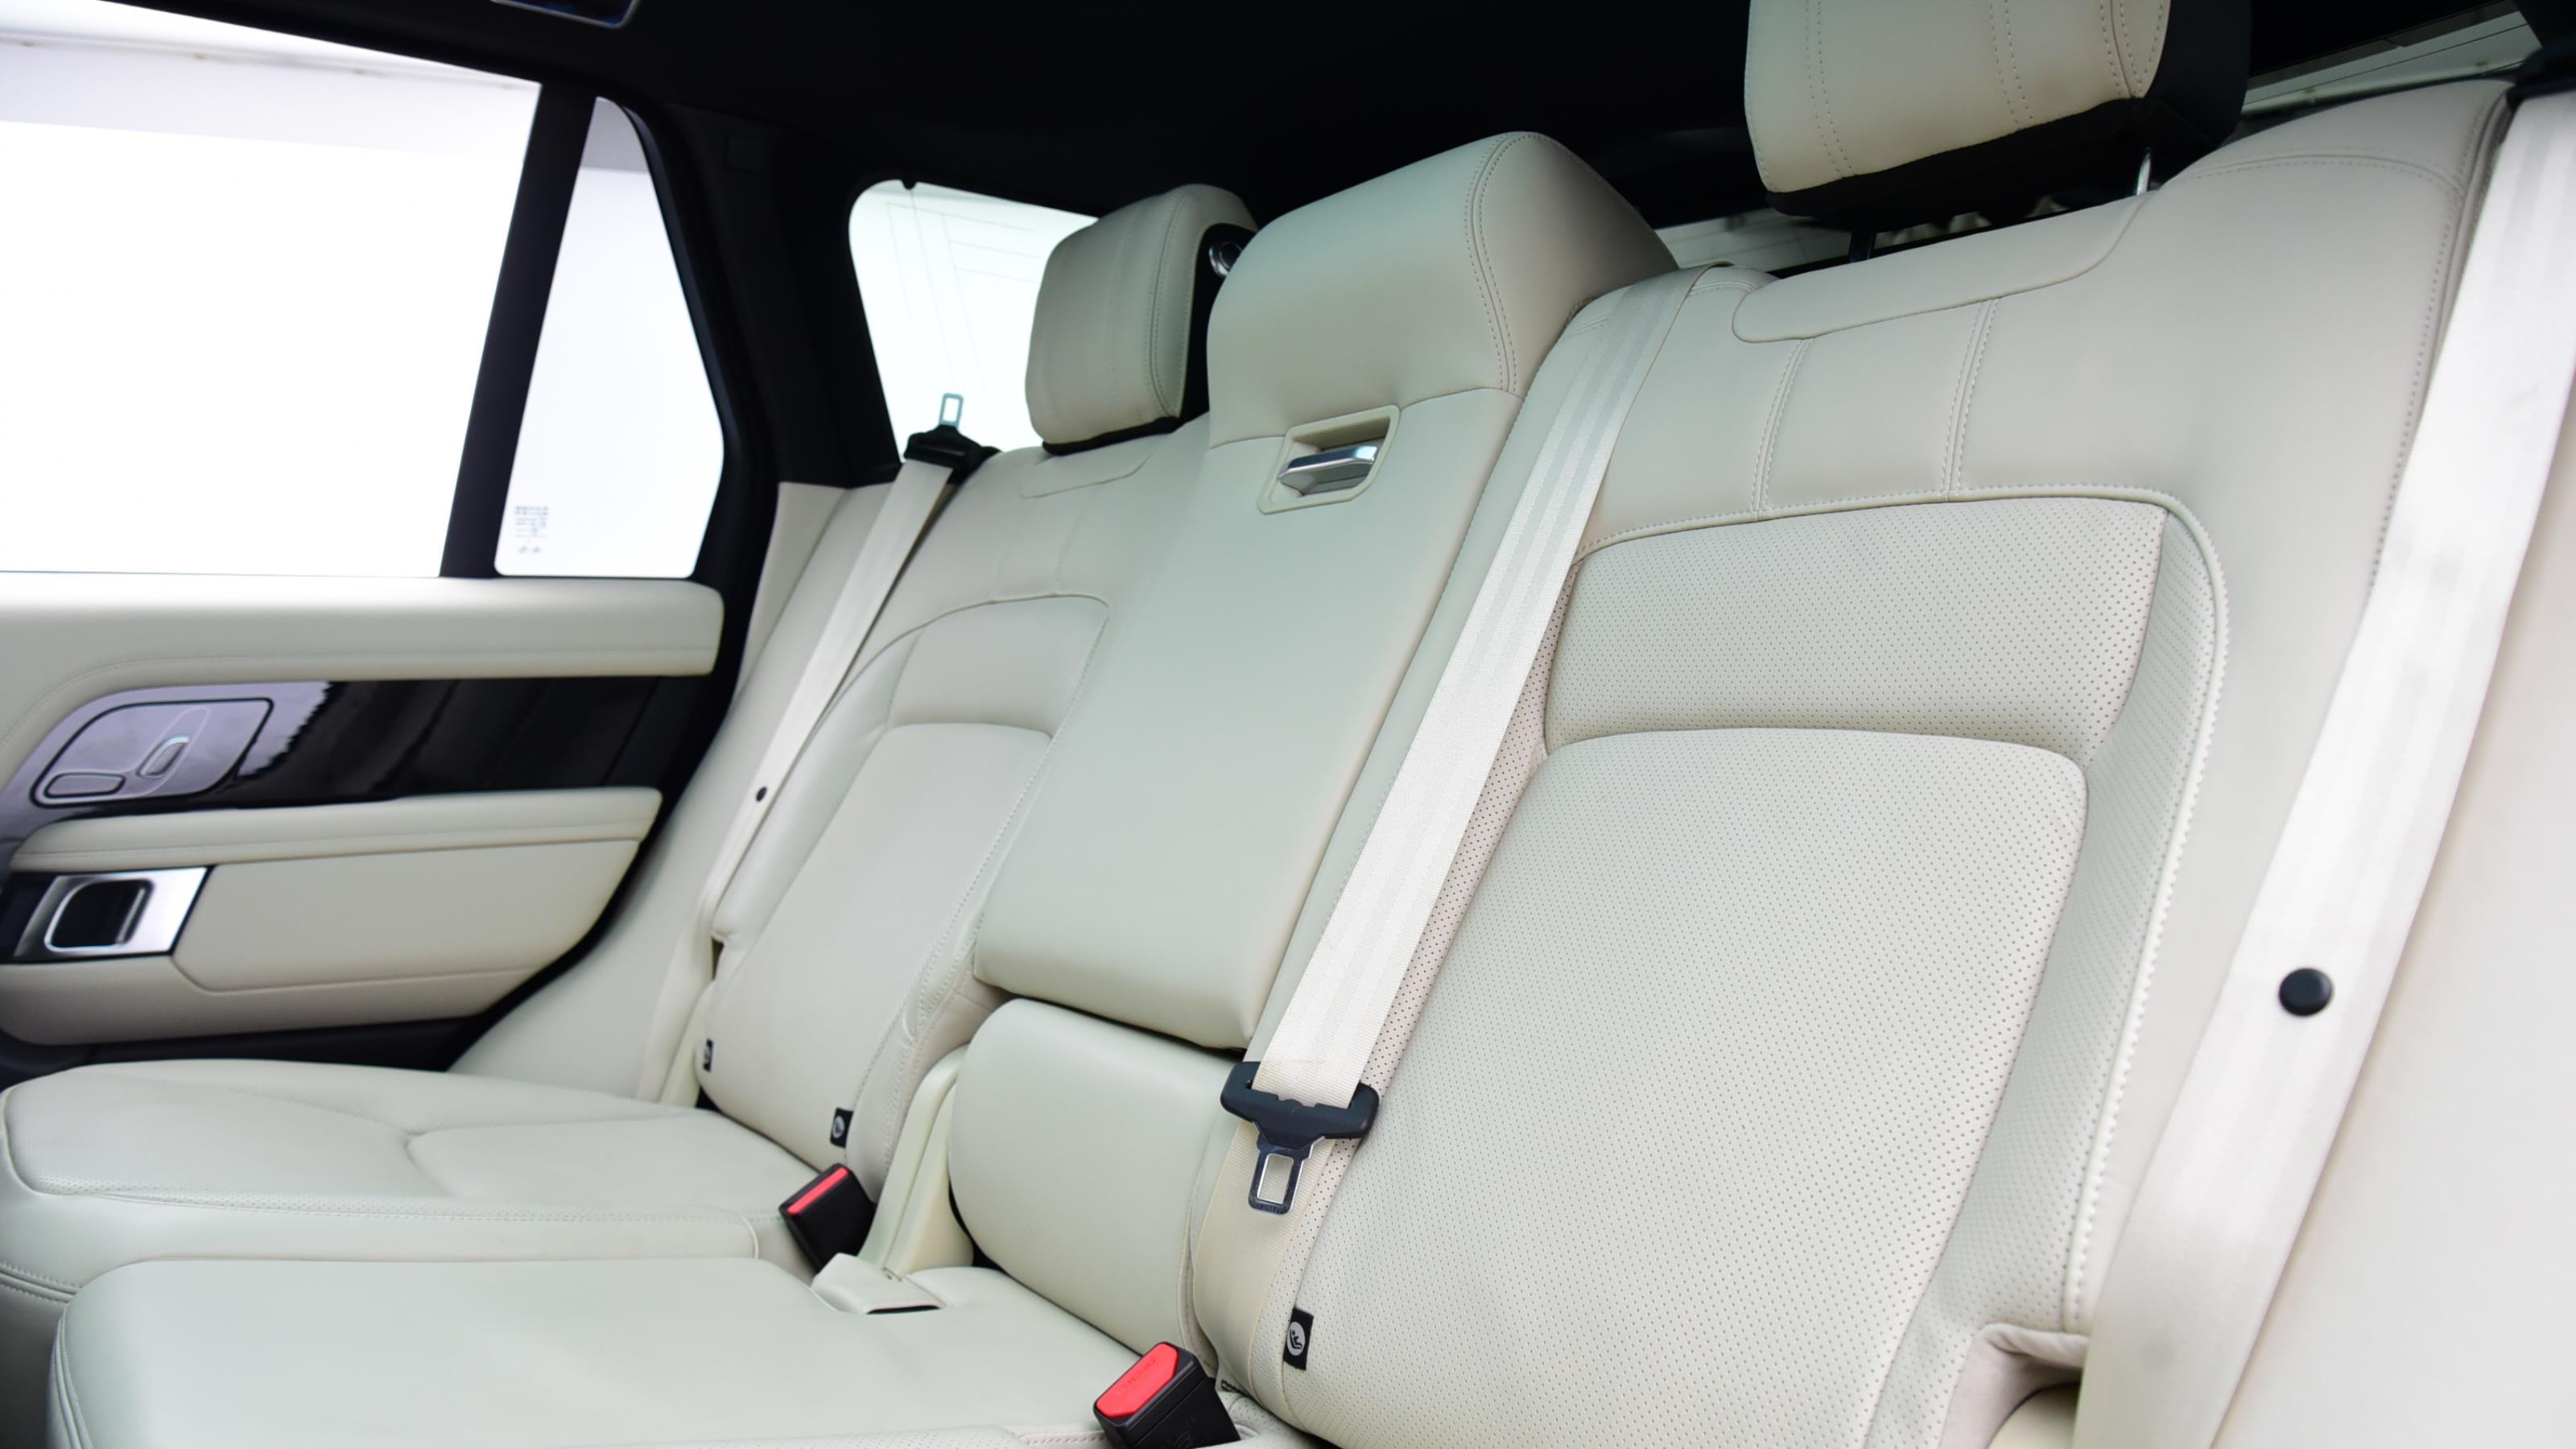 Used 2019 Land Rover RANGE ROVER 3.0 SDV6 Vogue 4dr Auto BLACK at Saxton4x4